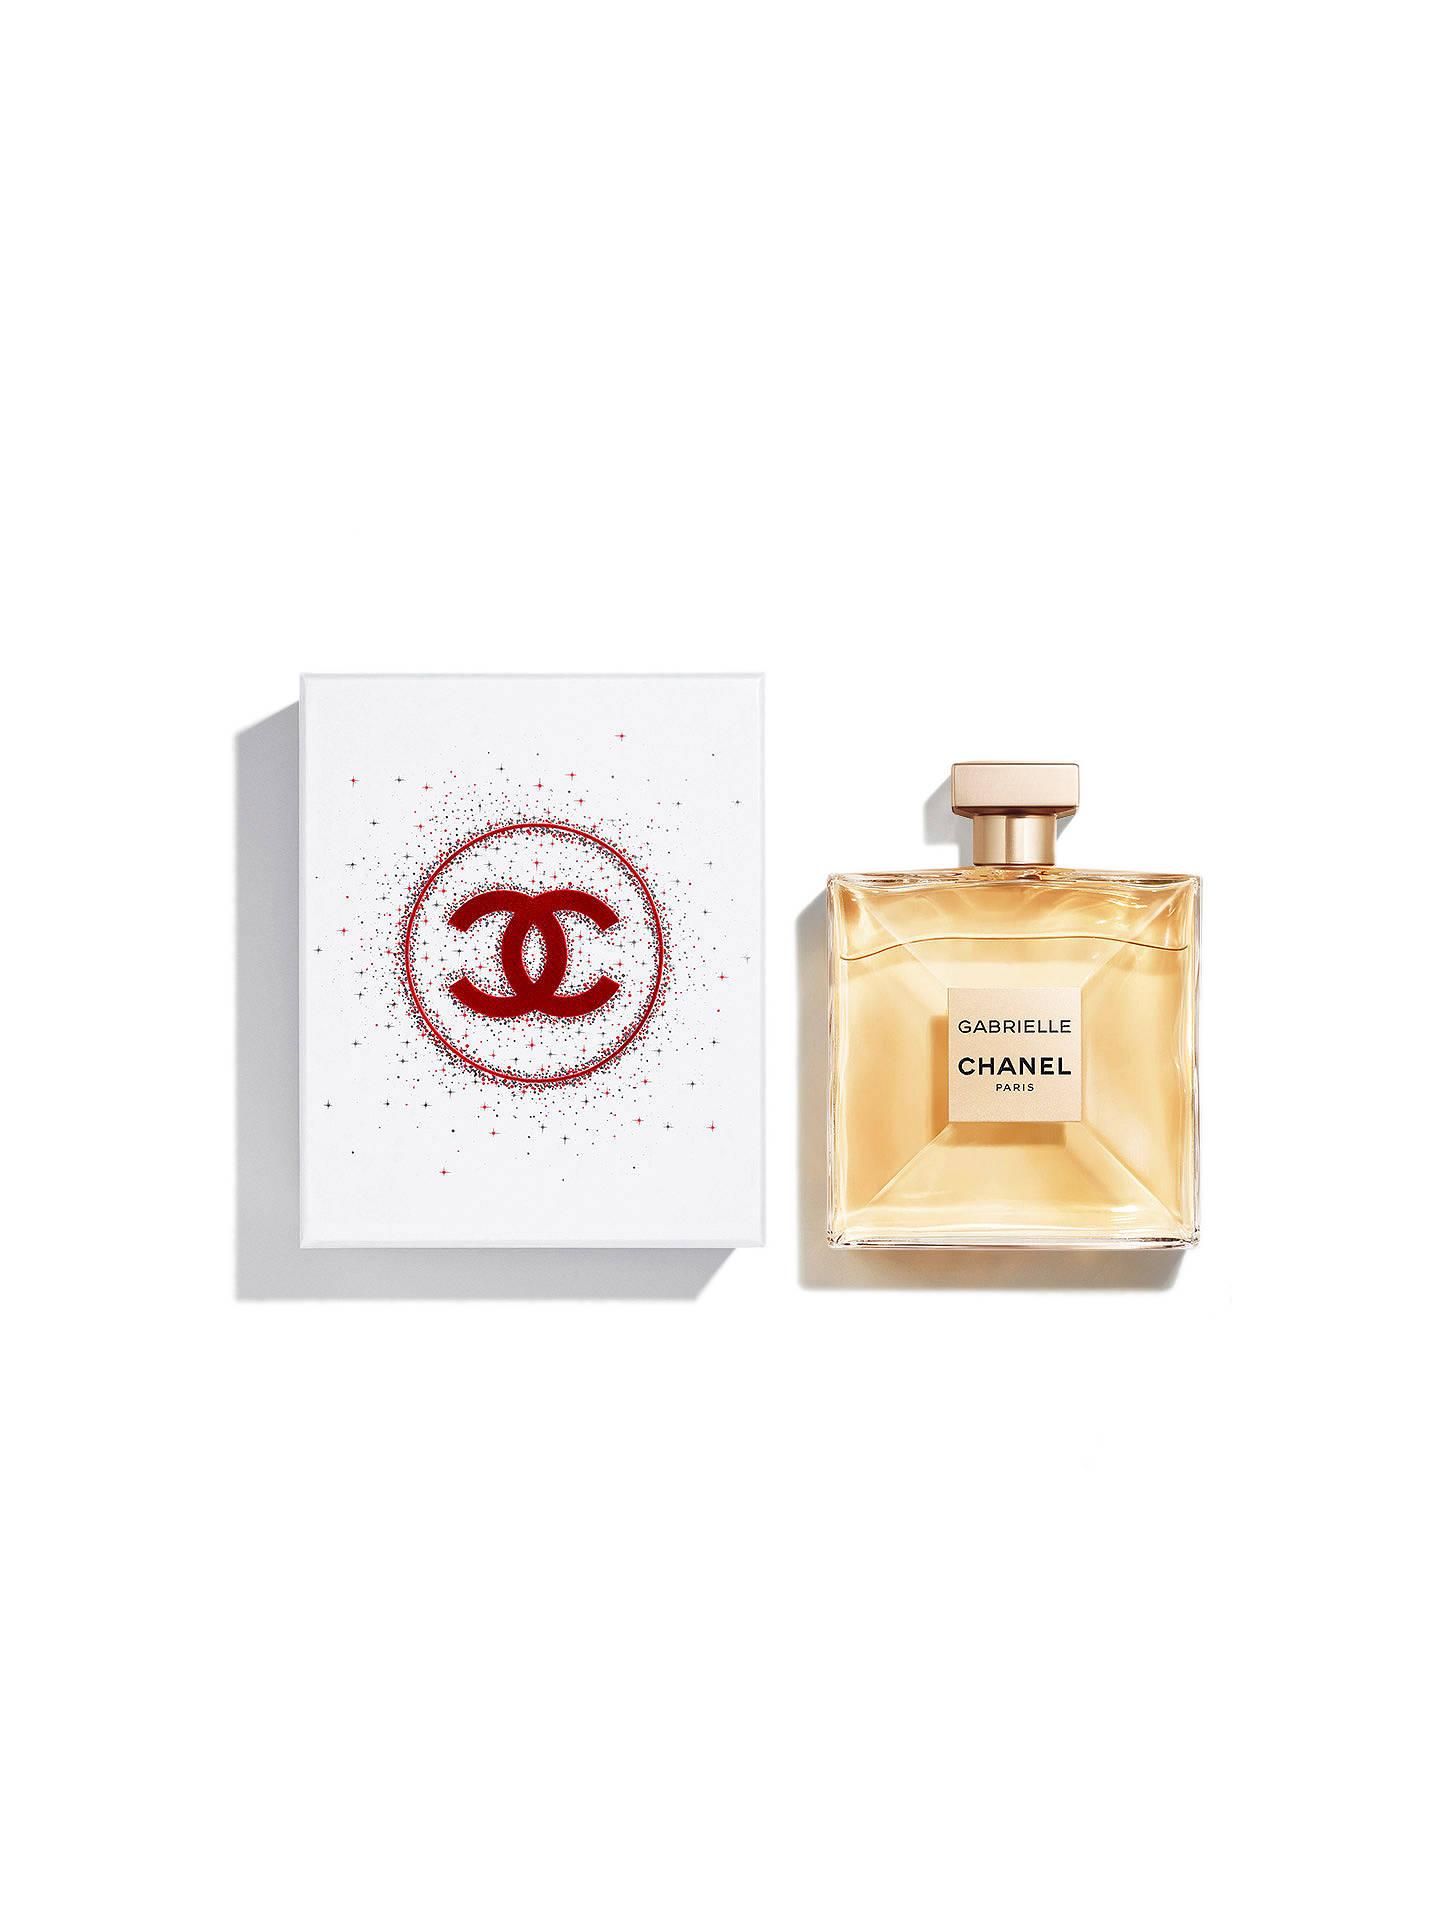 Chanel Gabrielle Chanel Eau De Parfum Spray 100ml With Gift Box At